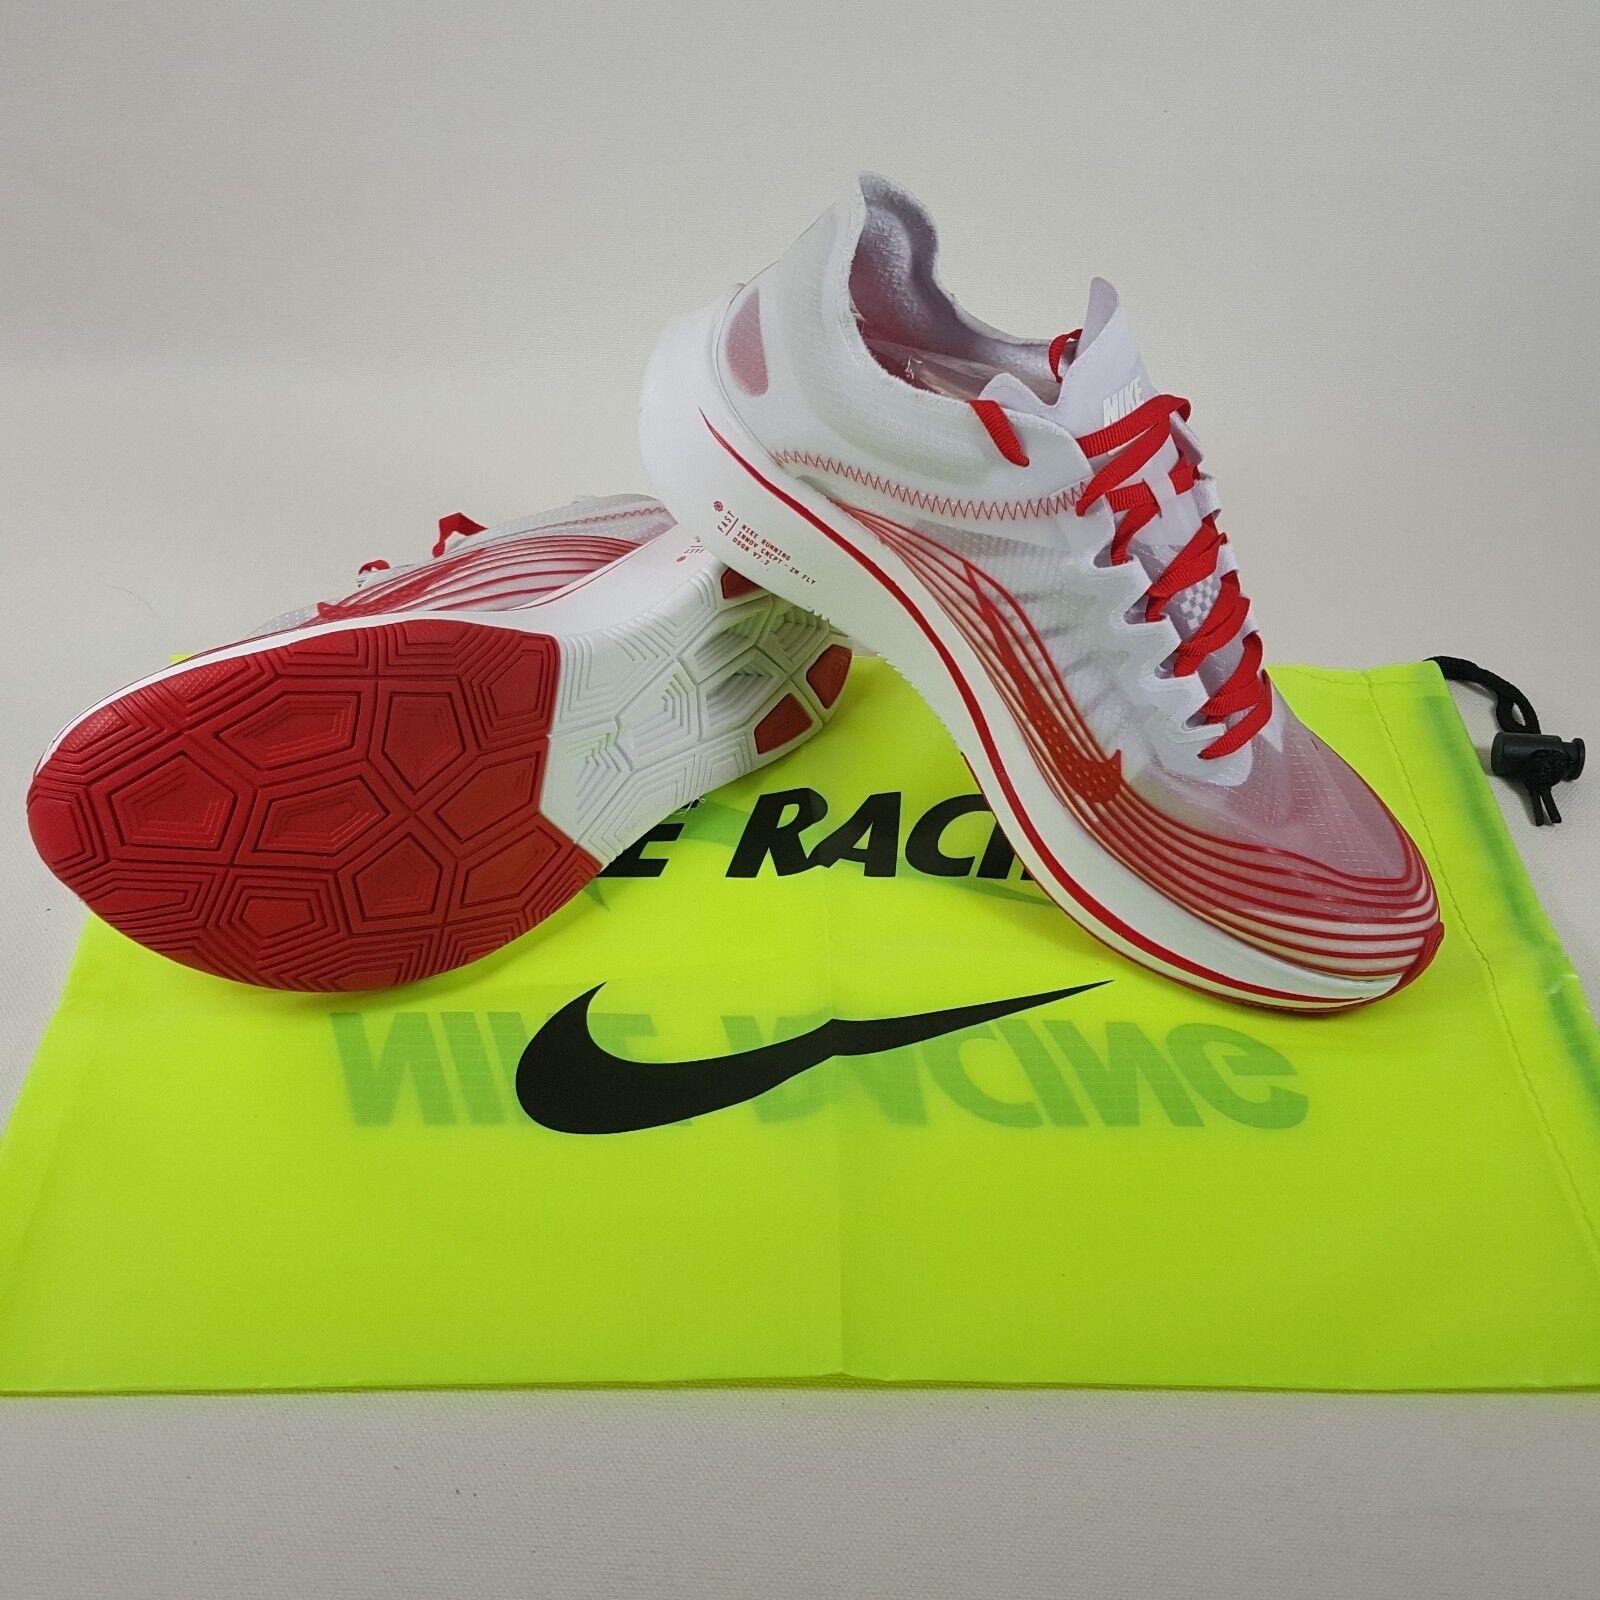 Nikelab tokyo nike zoom fly sp tokyo Nikelab bianco / university red scarpe da corsa uomo numero 9 d87924